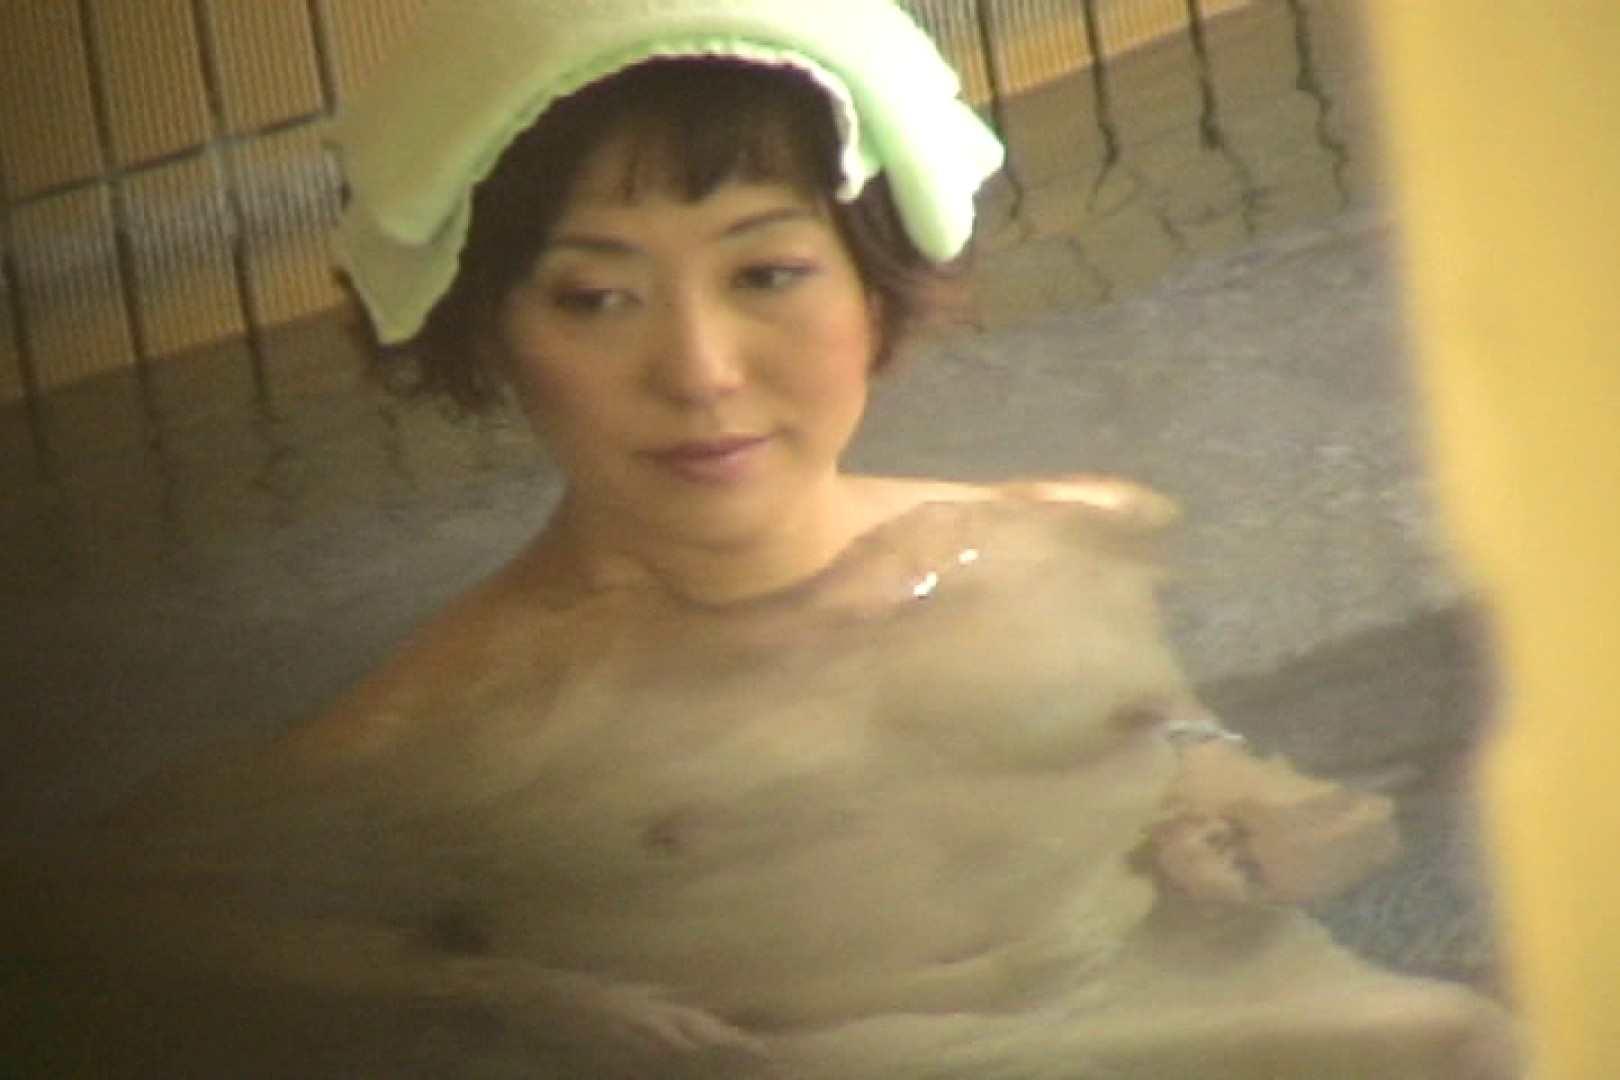 Aquaな露天風呂Vol.456 盗撮 | HなOL  102pic 87